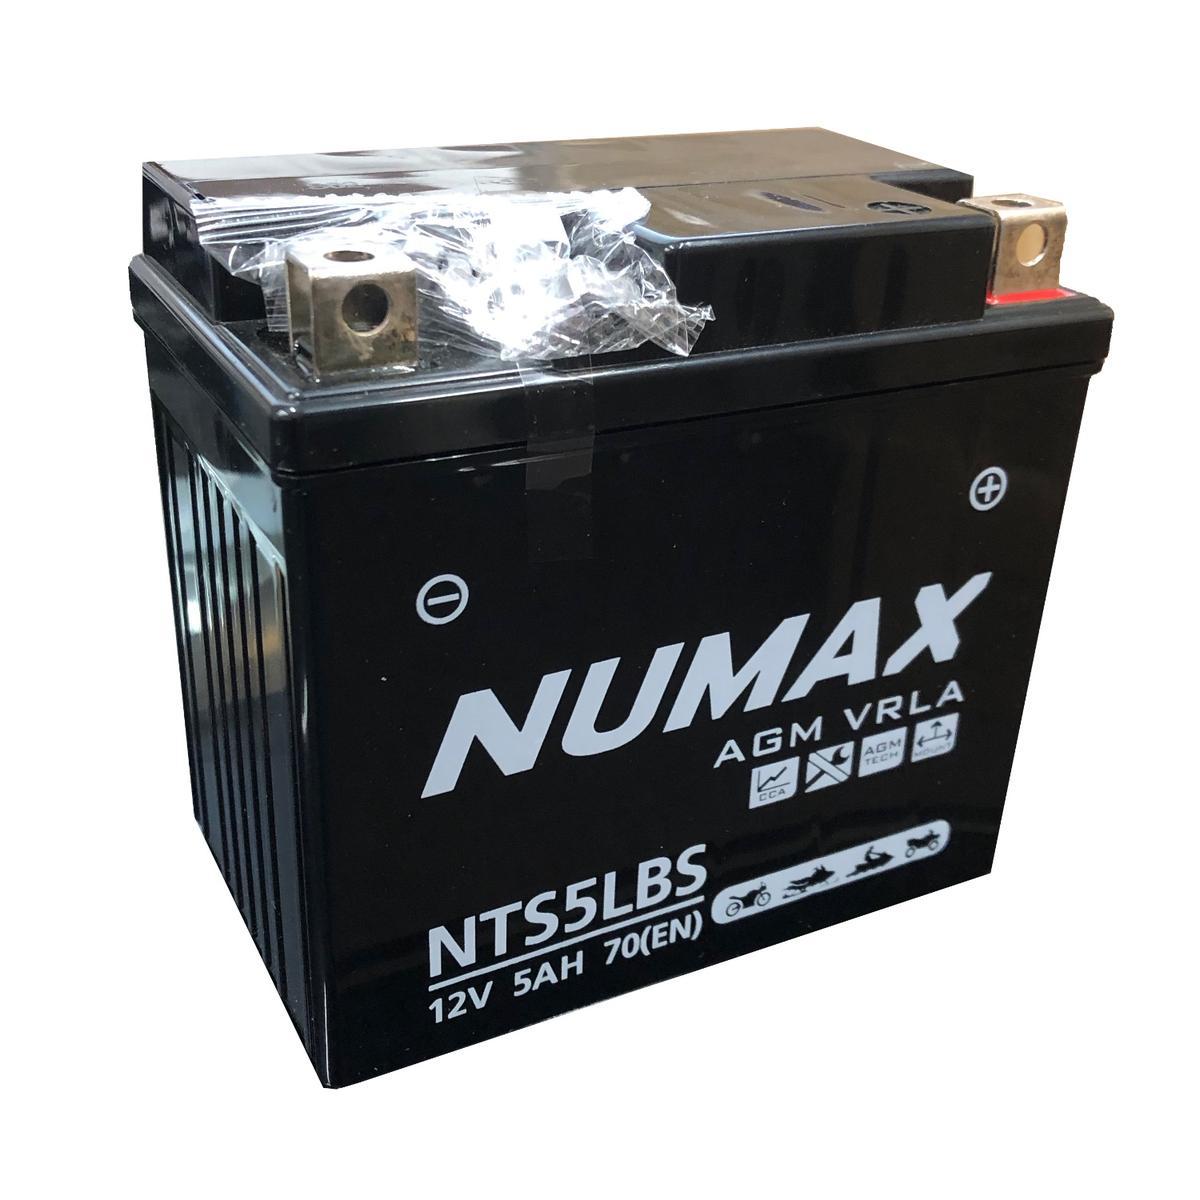 Numax 12v NTS5LBS Motorbike Bike Battery YAMAHA 90cc BWs100 YTX5L-4